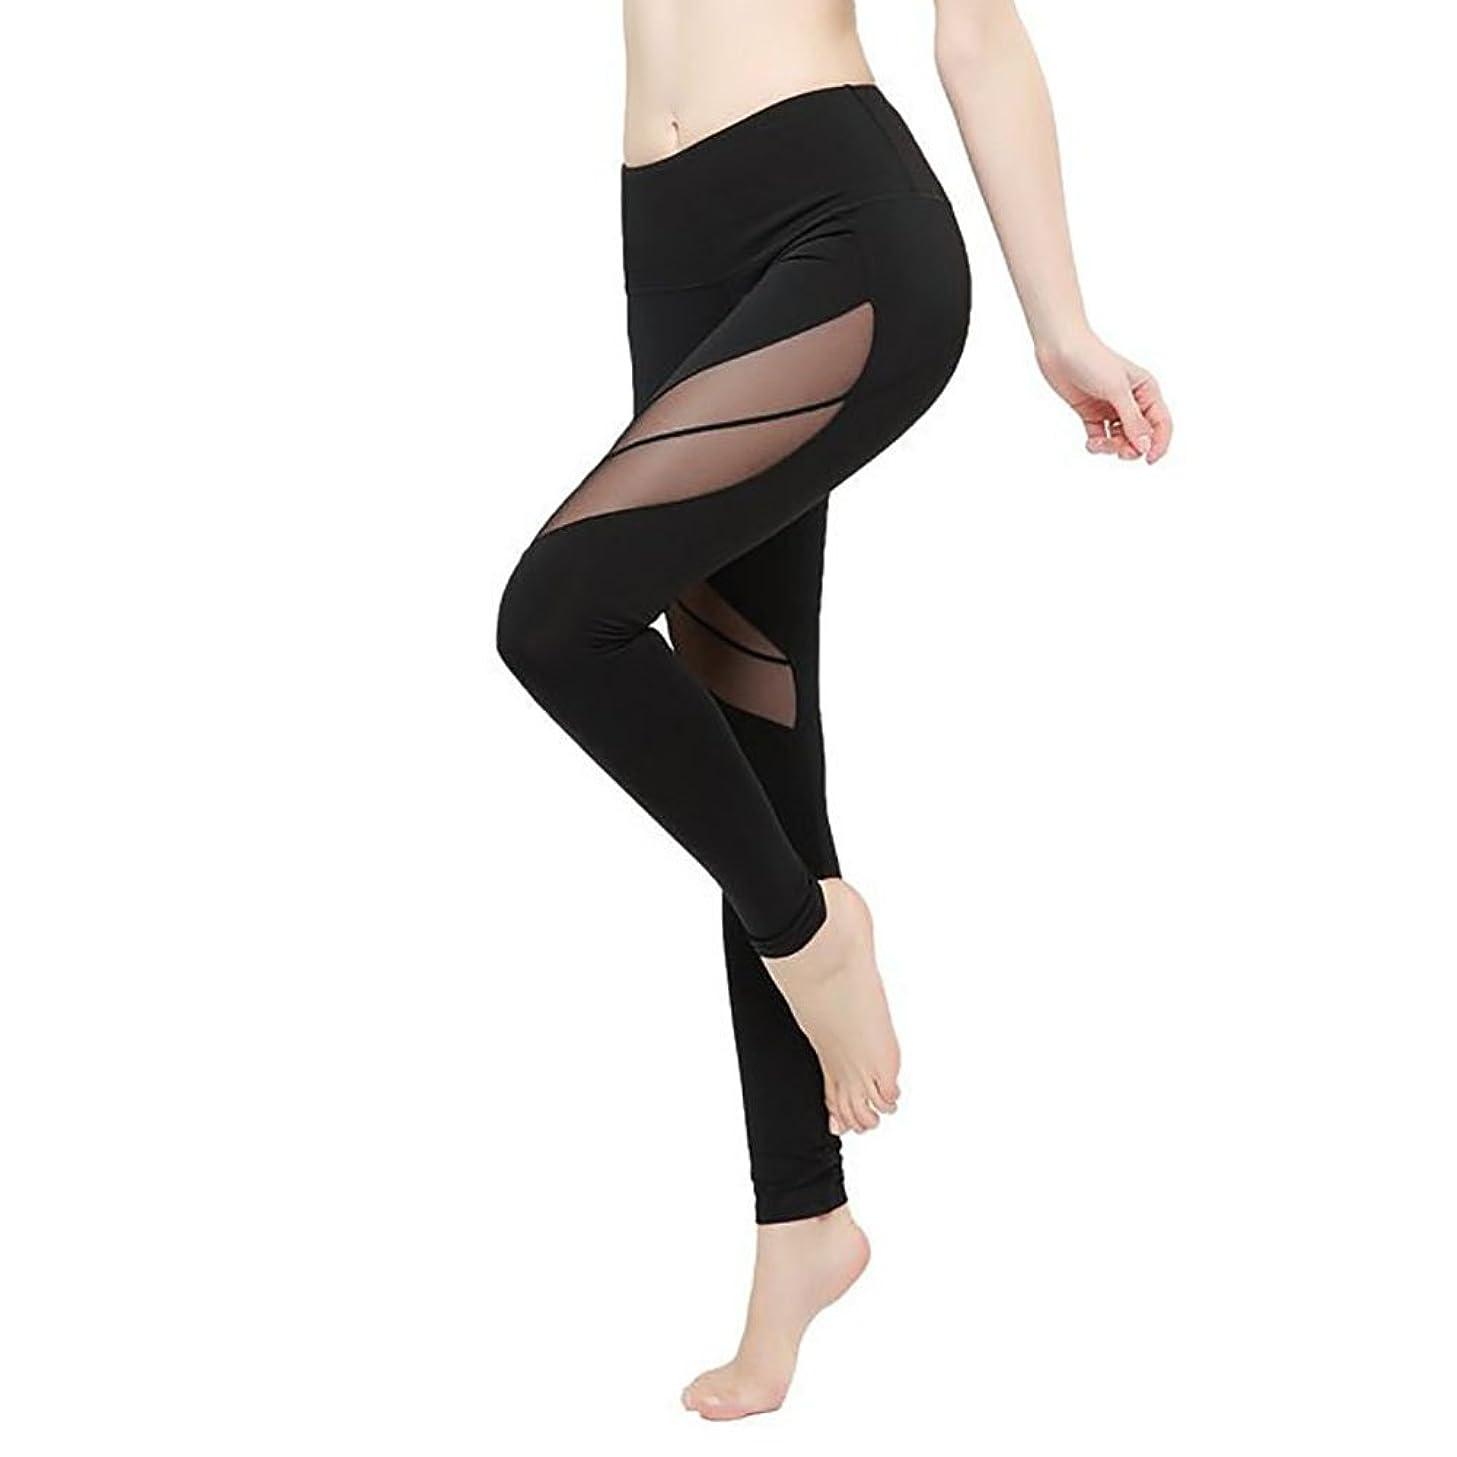 SOUTEAM Yoga Pants Yoga Capris Leggings - Gifts for Women no See Through Yoga Leggings 4 Way Stretch Dance Pants with Pocket